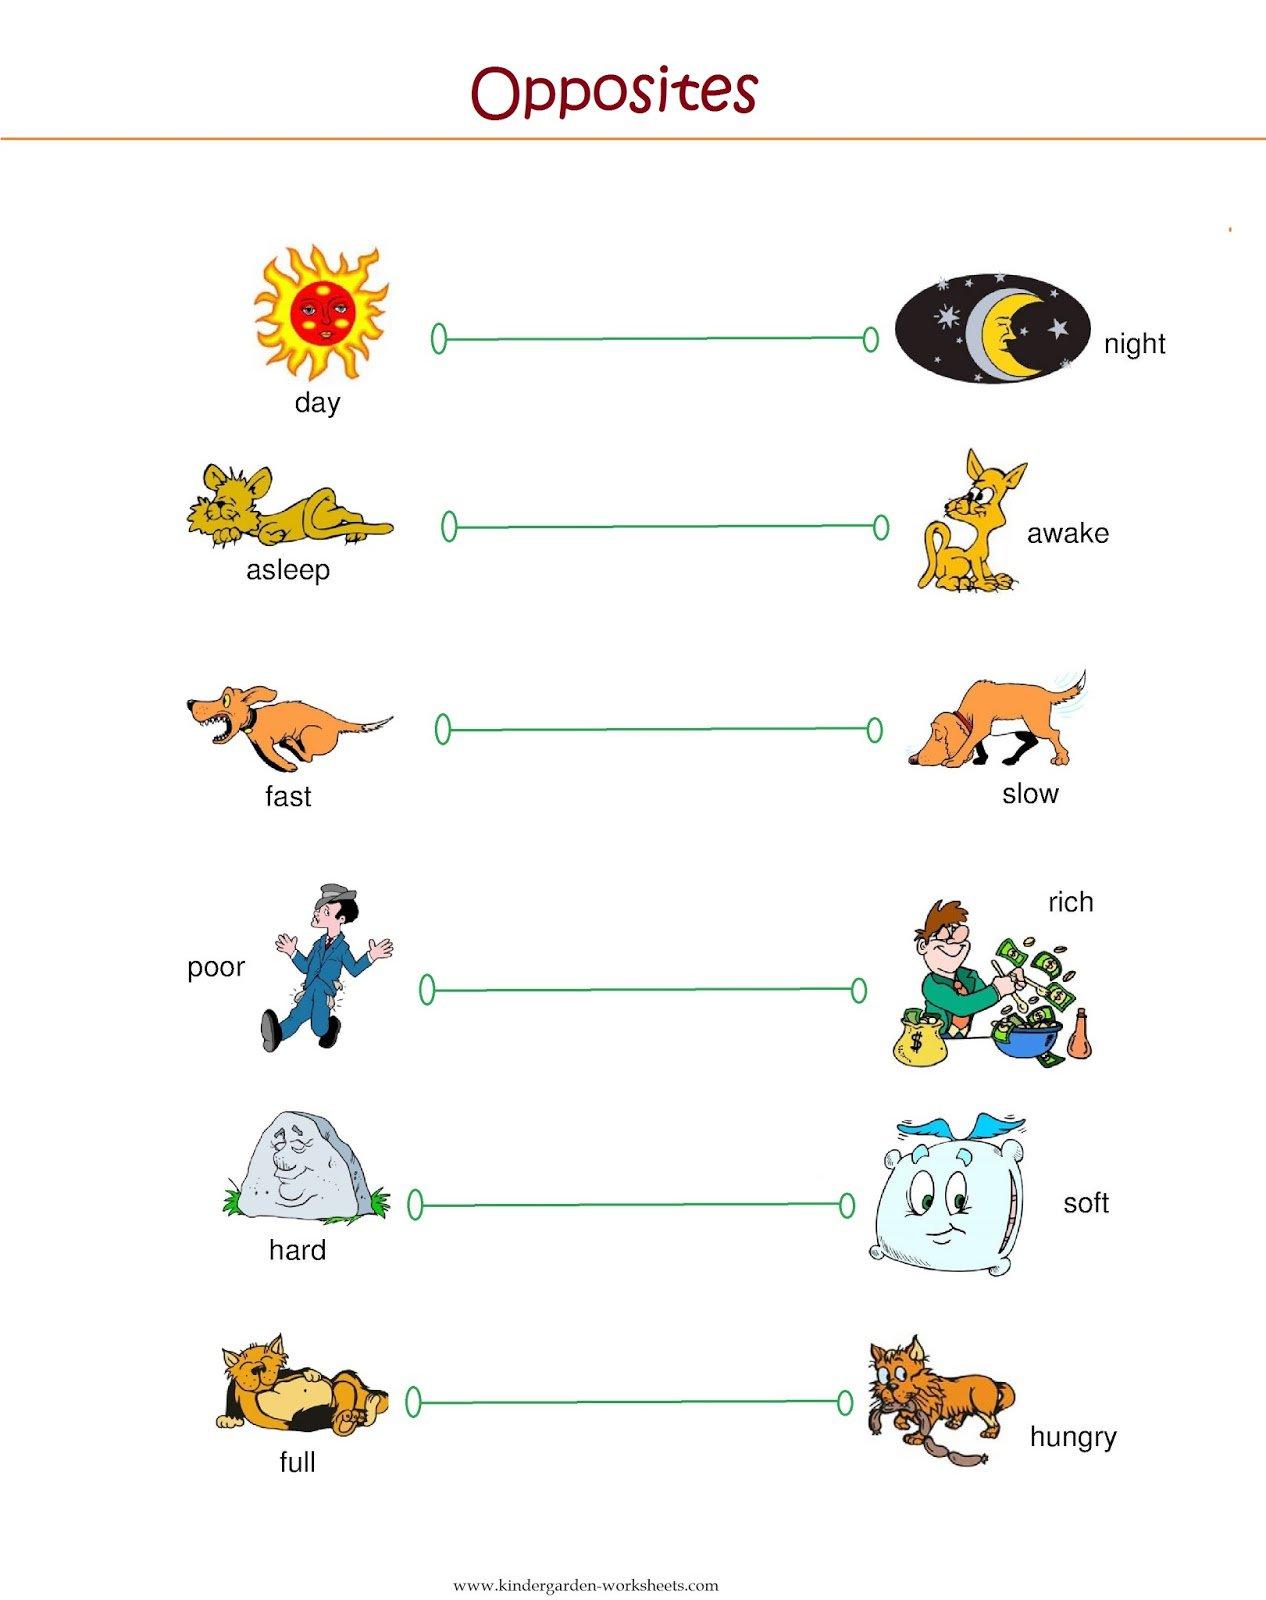 Opposite Words Worksheets For Kindergarten The Best Worksheets